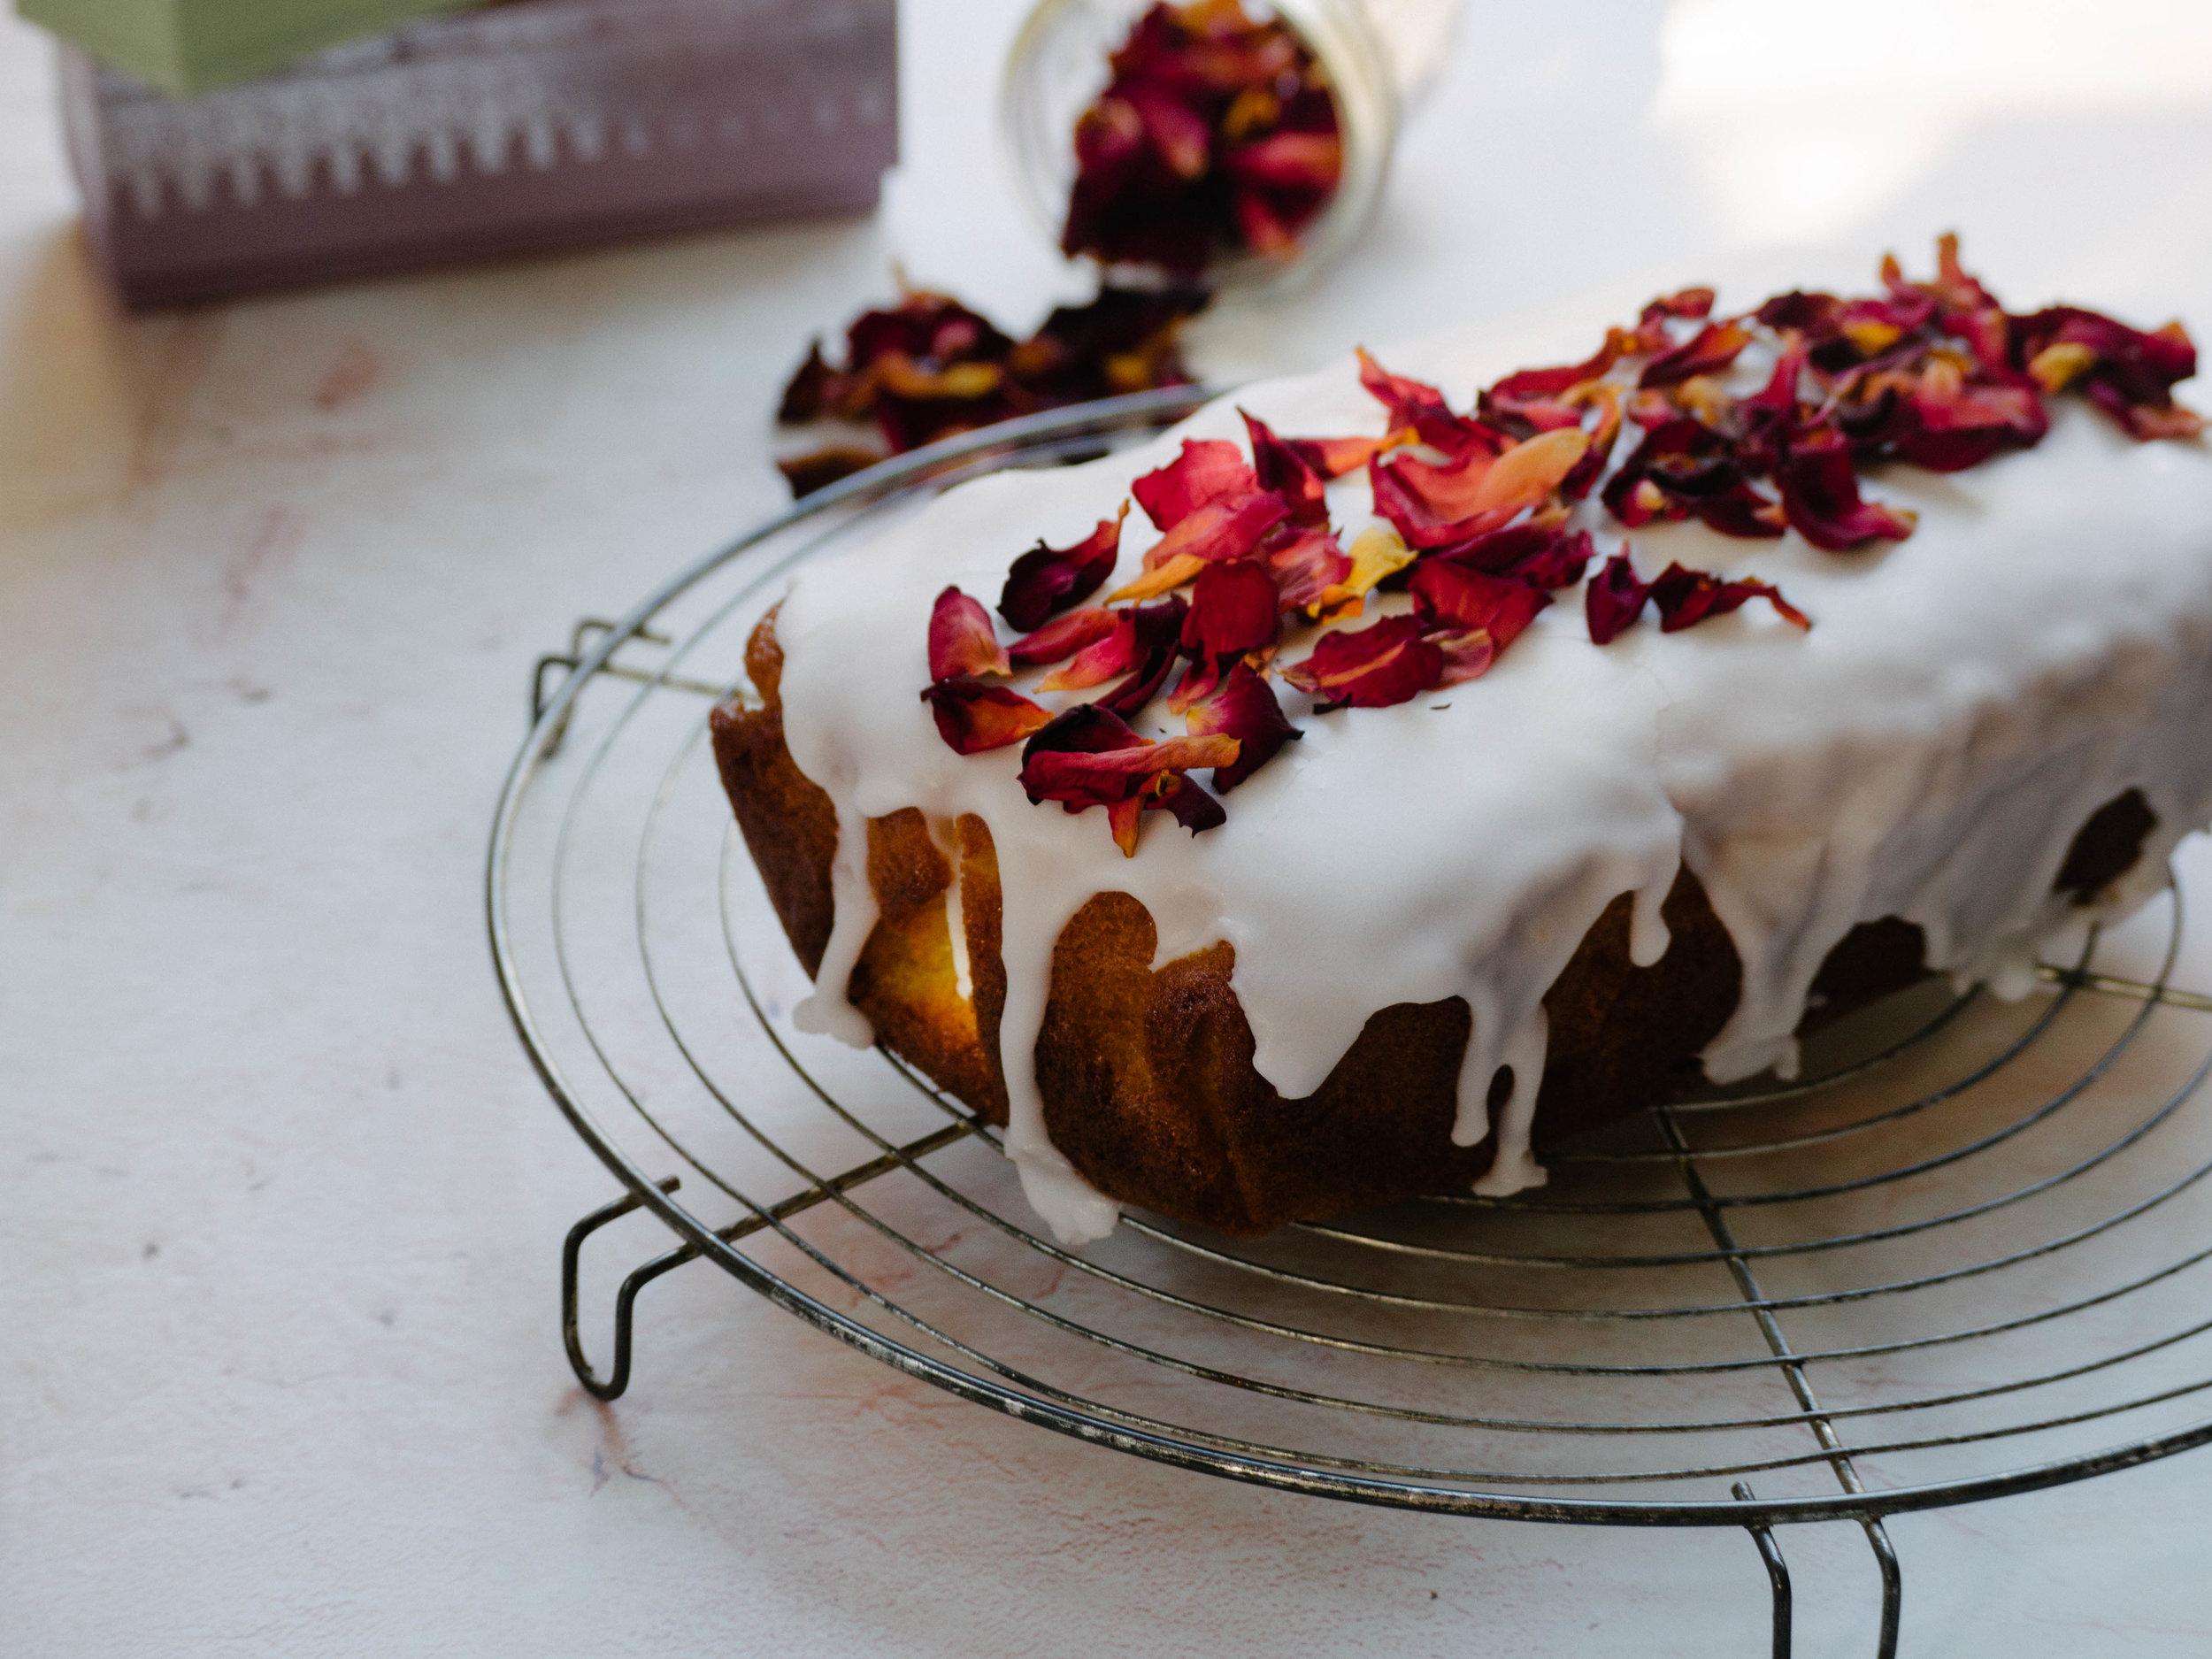 Ladurée Inspired Rose Cake